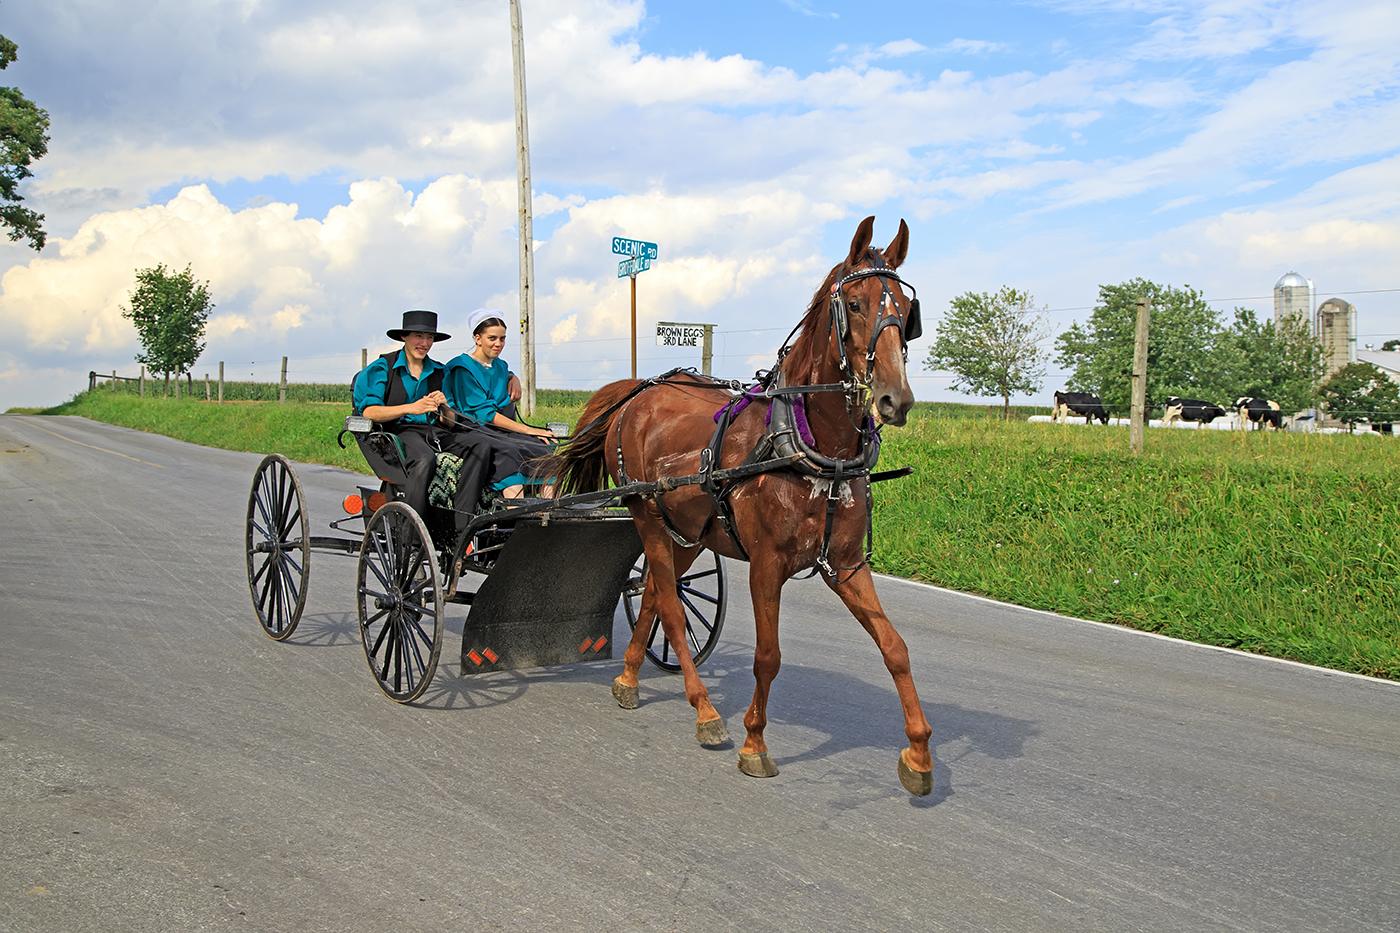 Casal anda em charrete puxada por cavalo (Shutterstock)